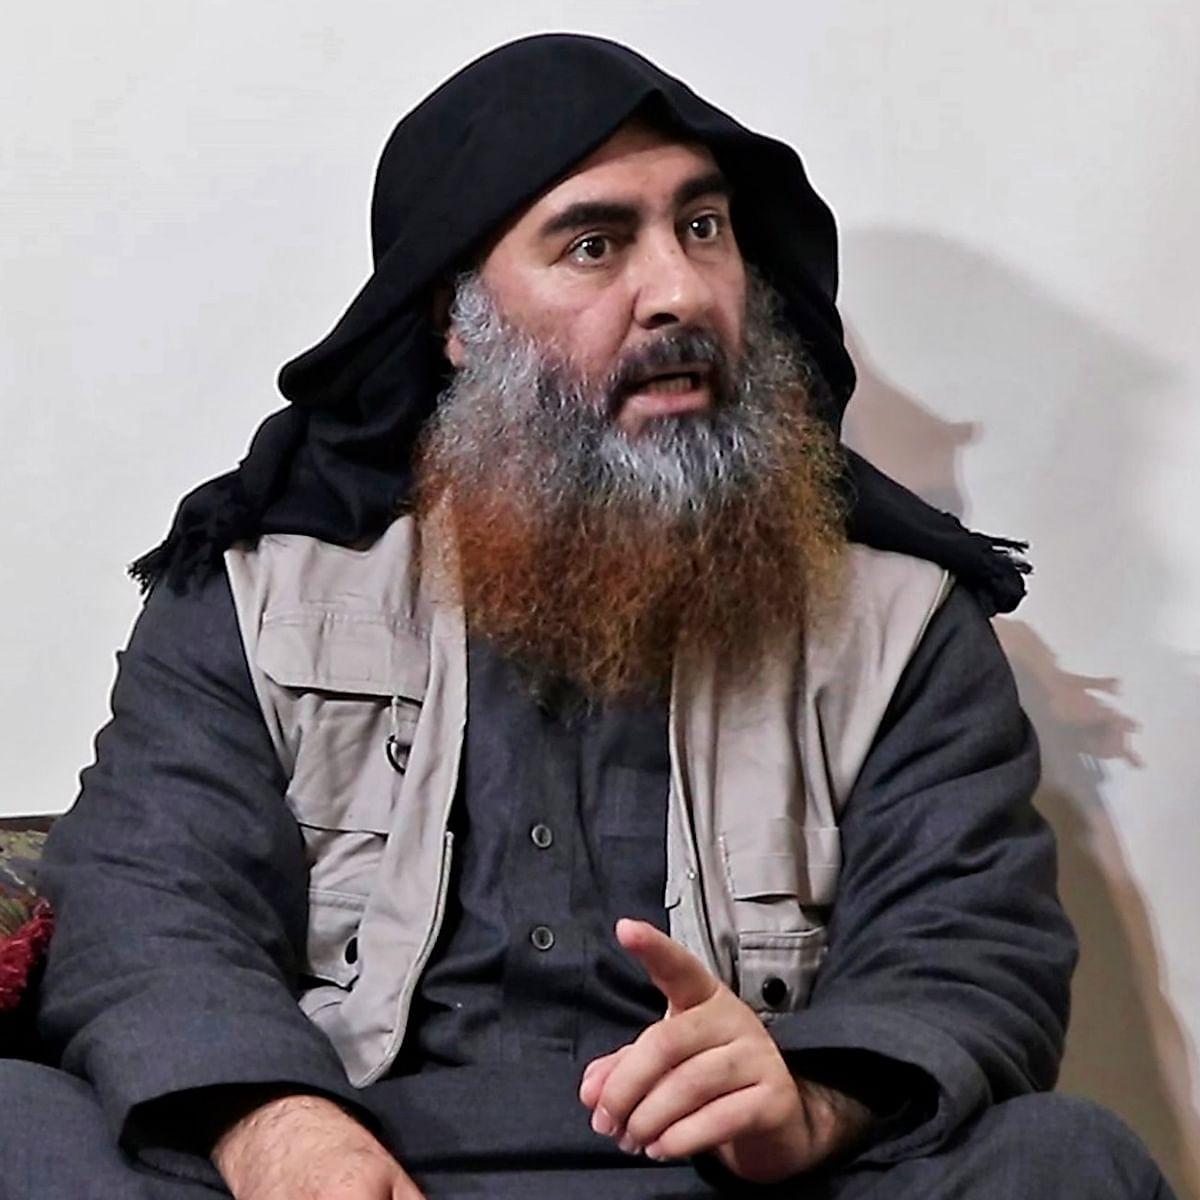 Many uses of al-Baghdadi: Why did the US kill him?